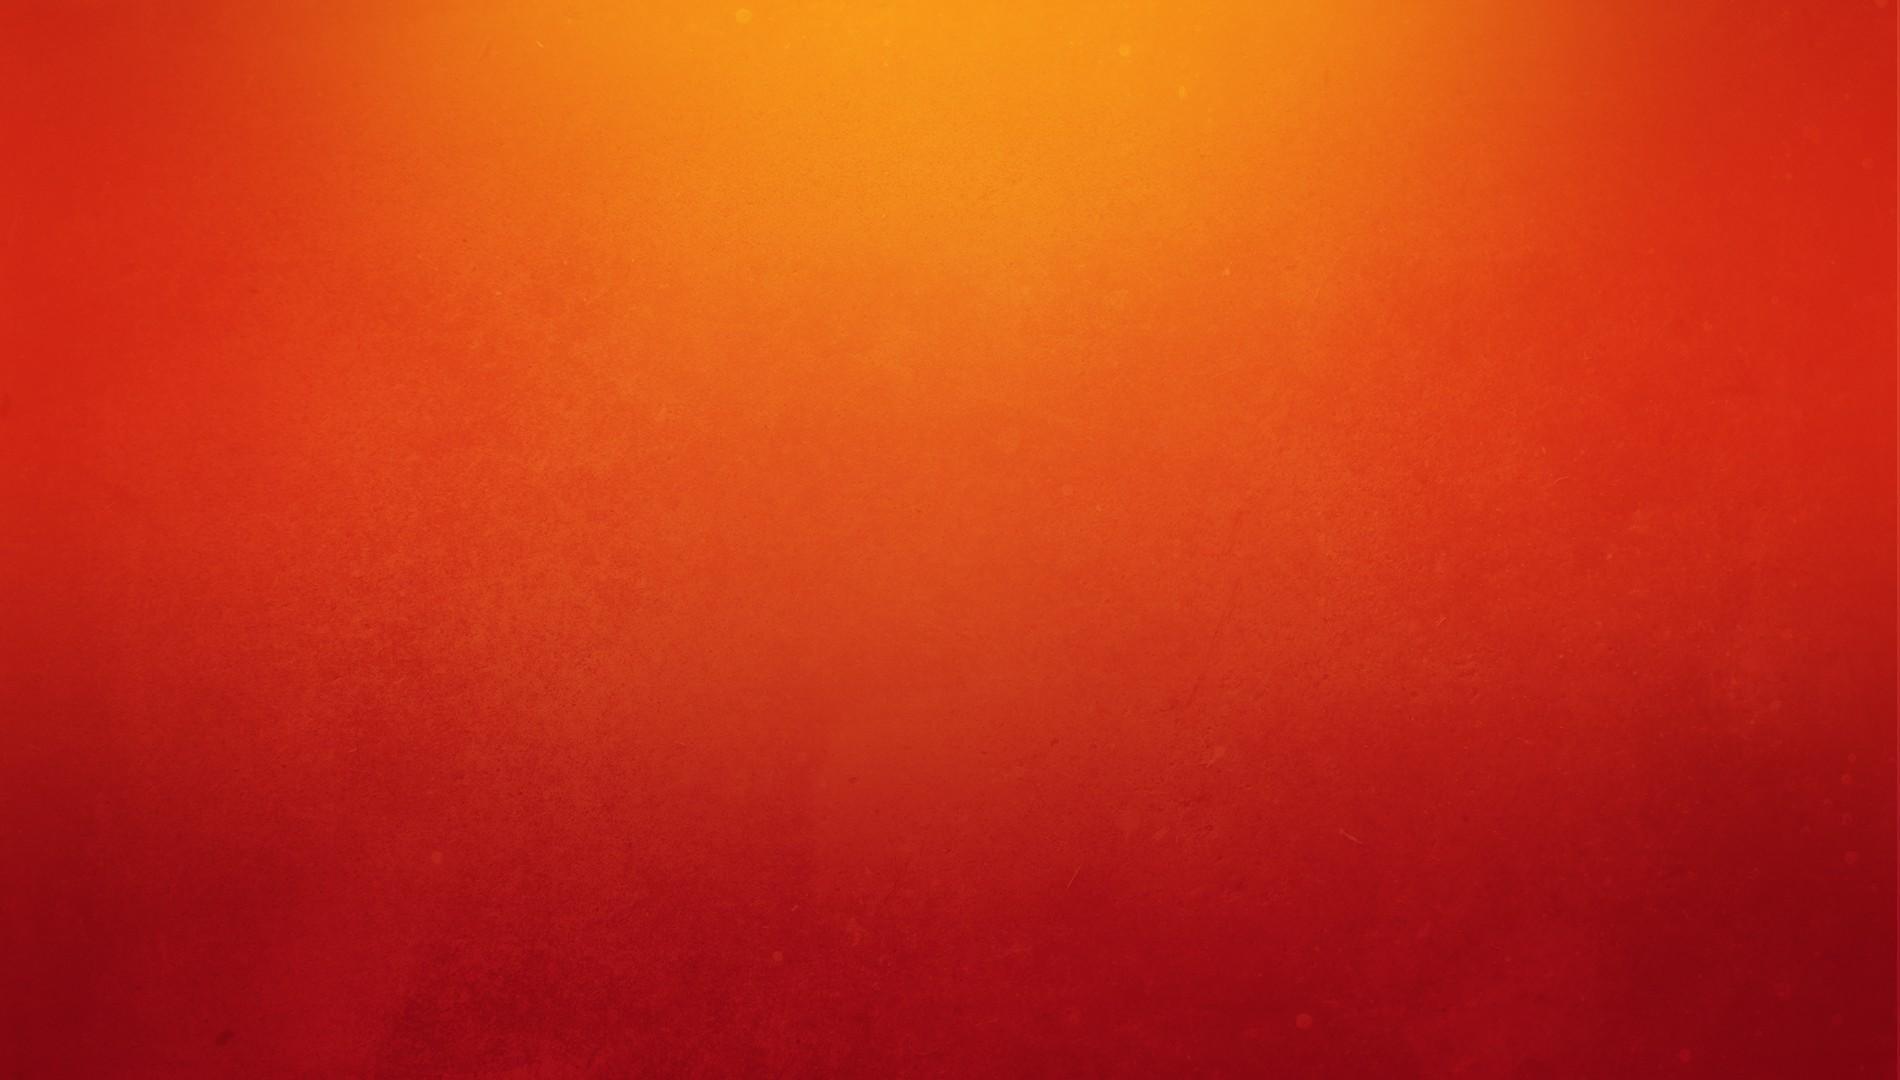 Fondos De Pantalla : Minimalismo, Rojo, Sencillo, Sol